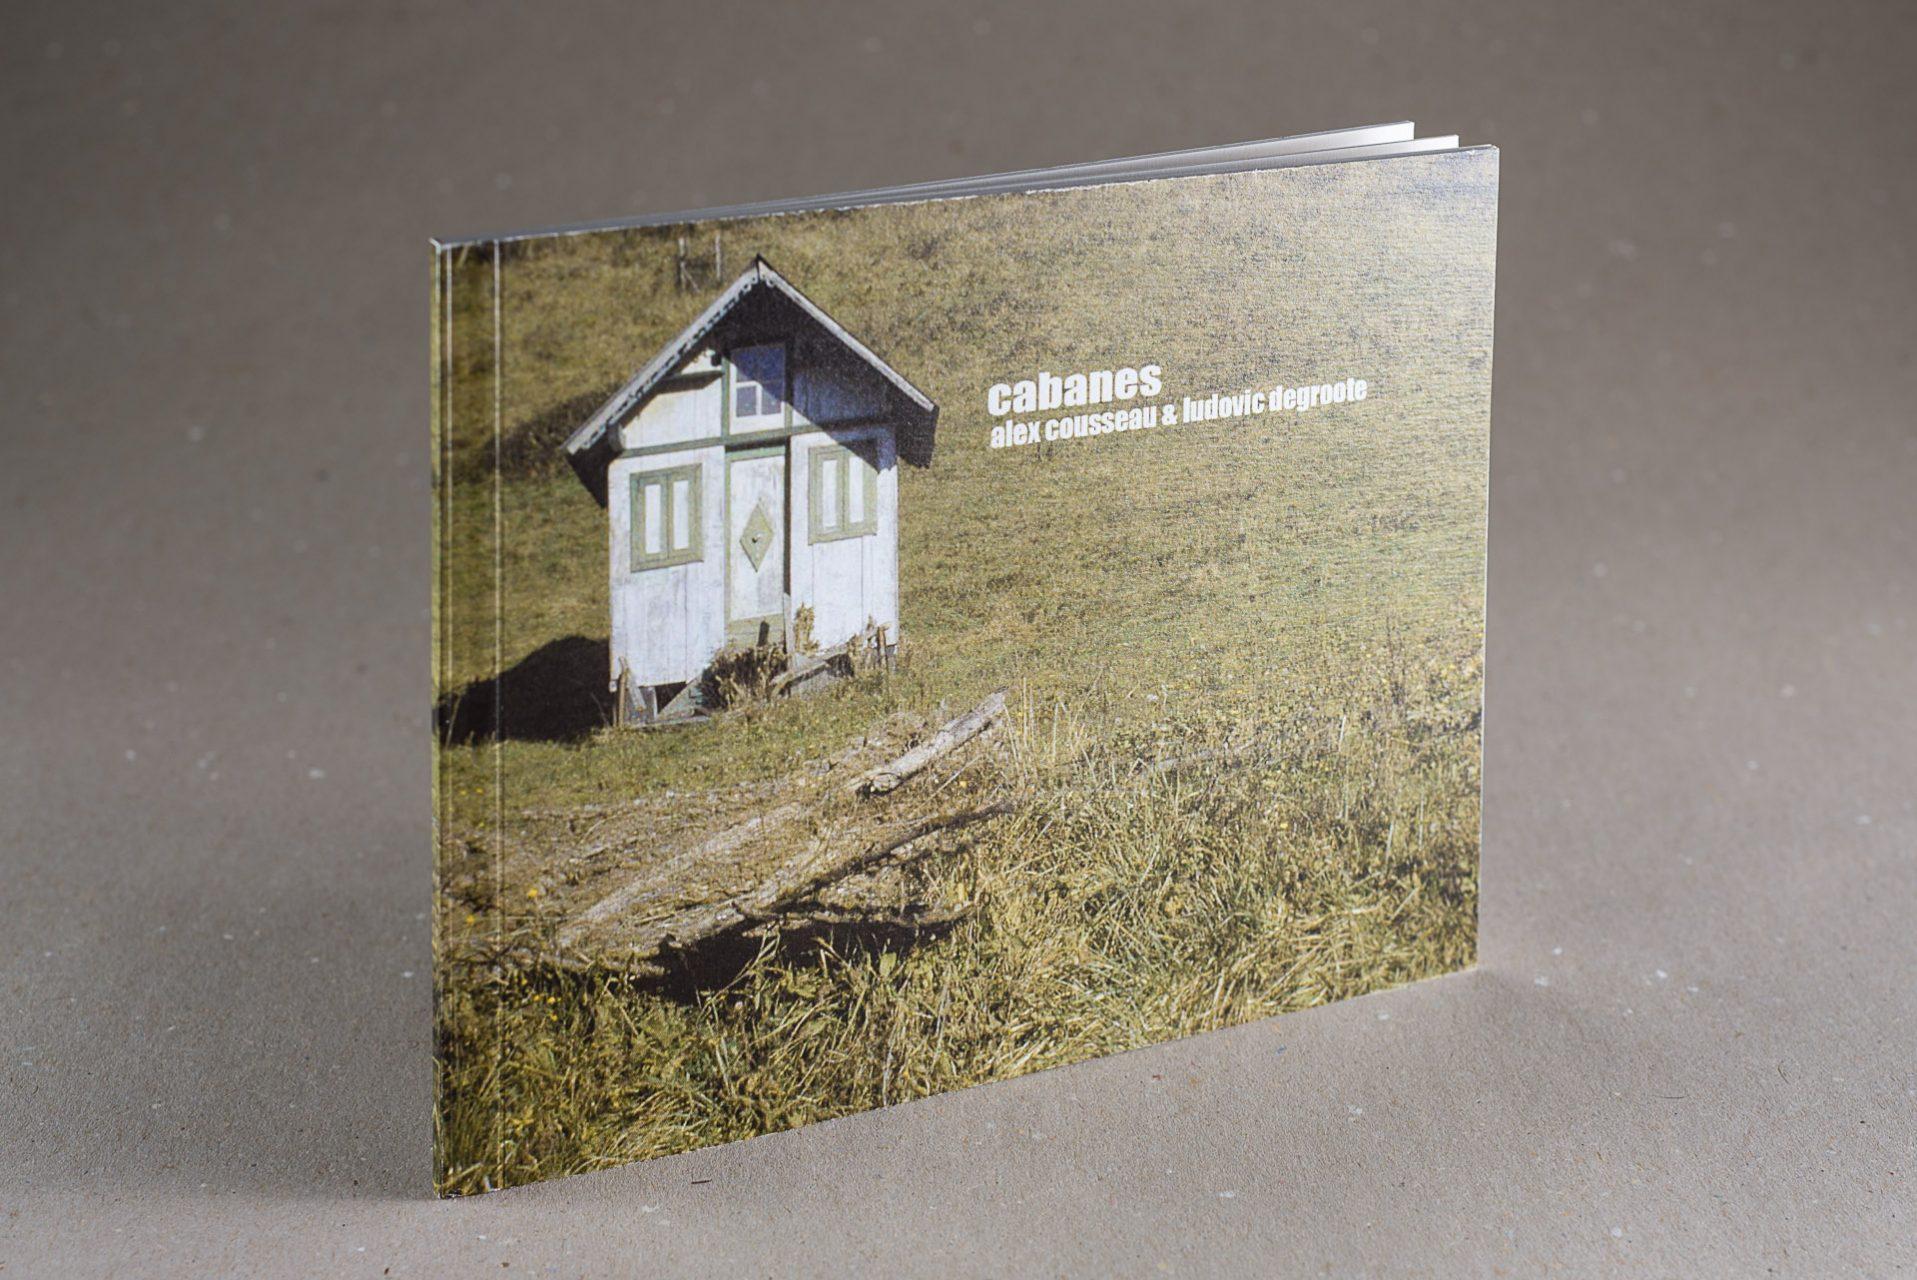 web-hd-nuit-myrtide-livre-cabanes-cousseau-degroote-01